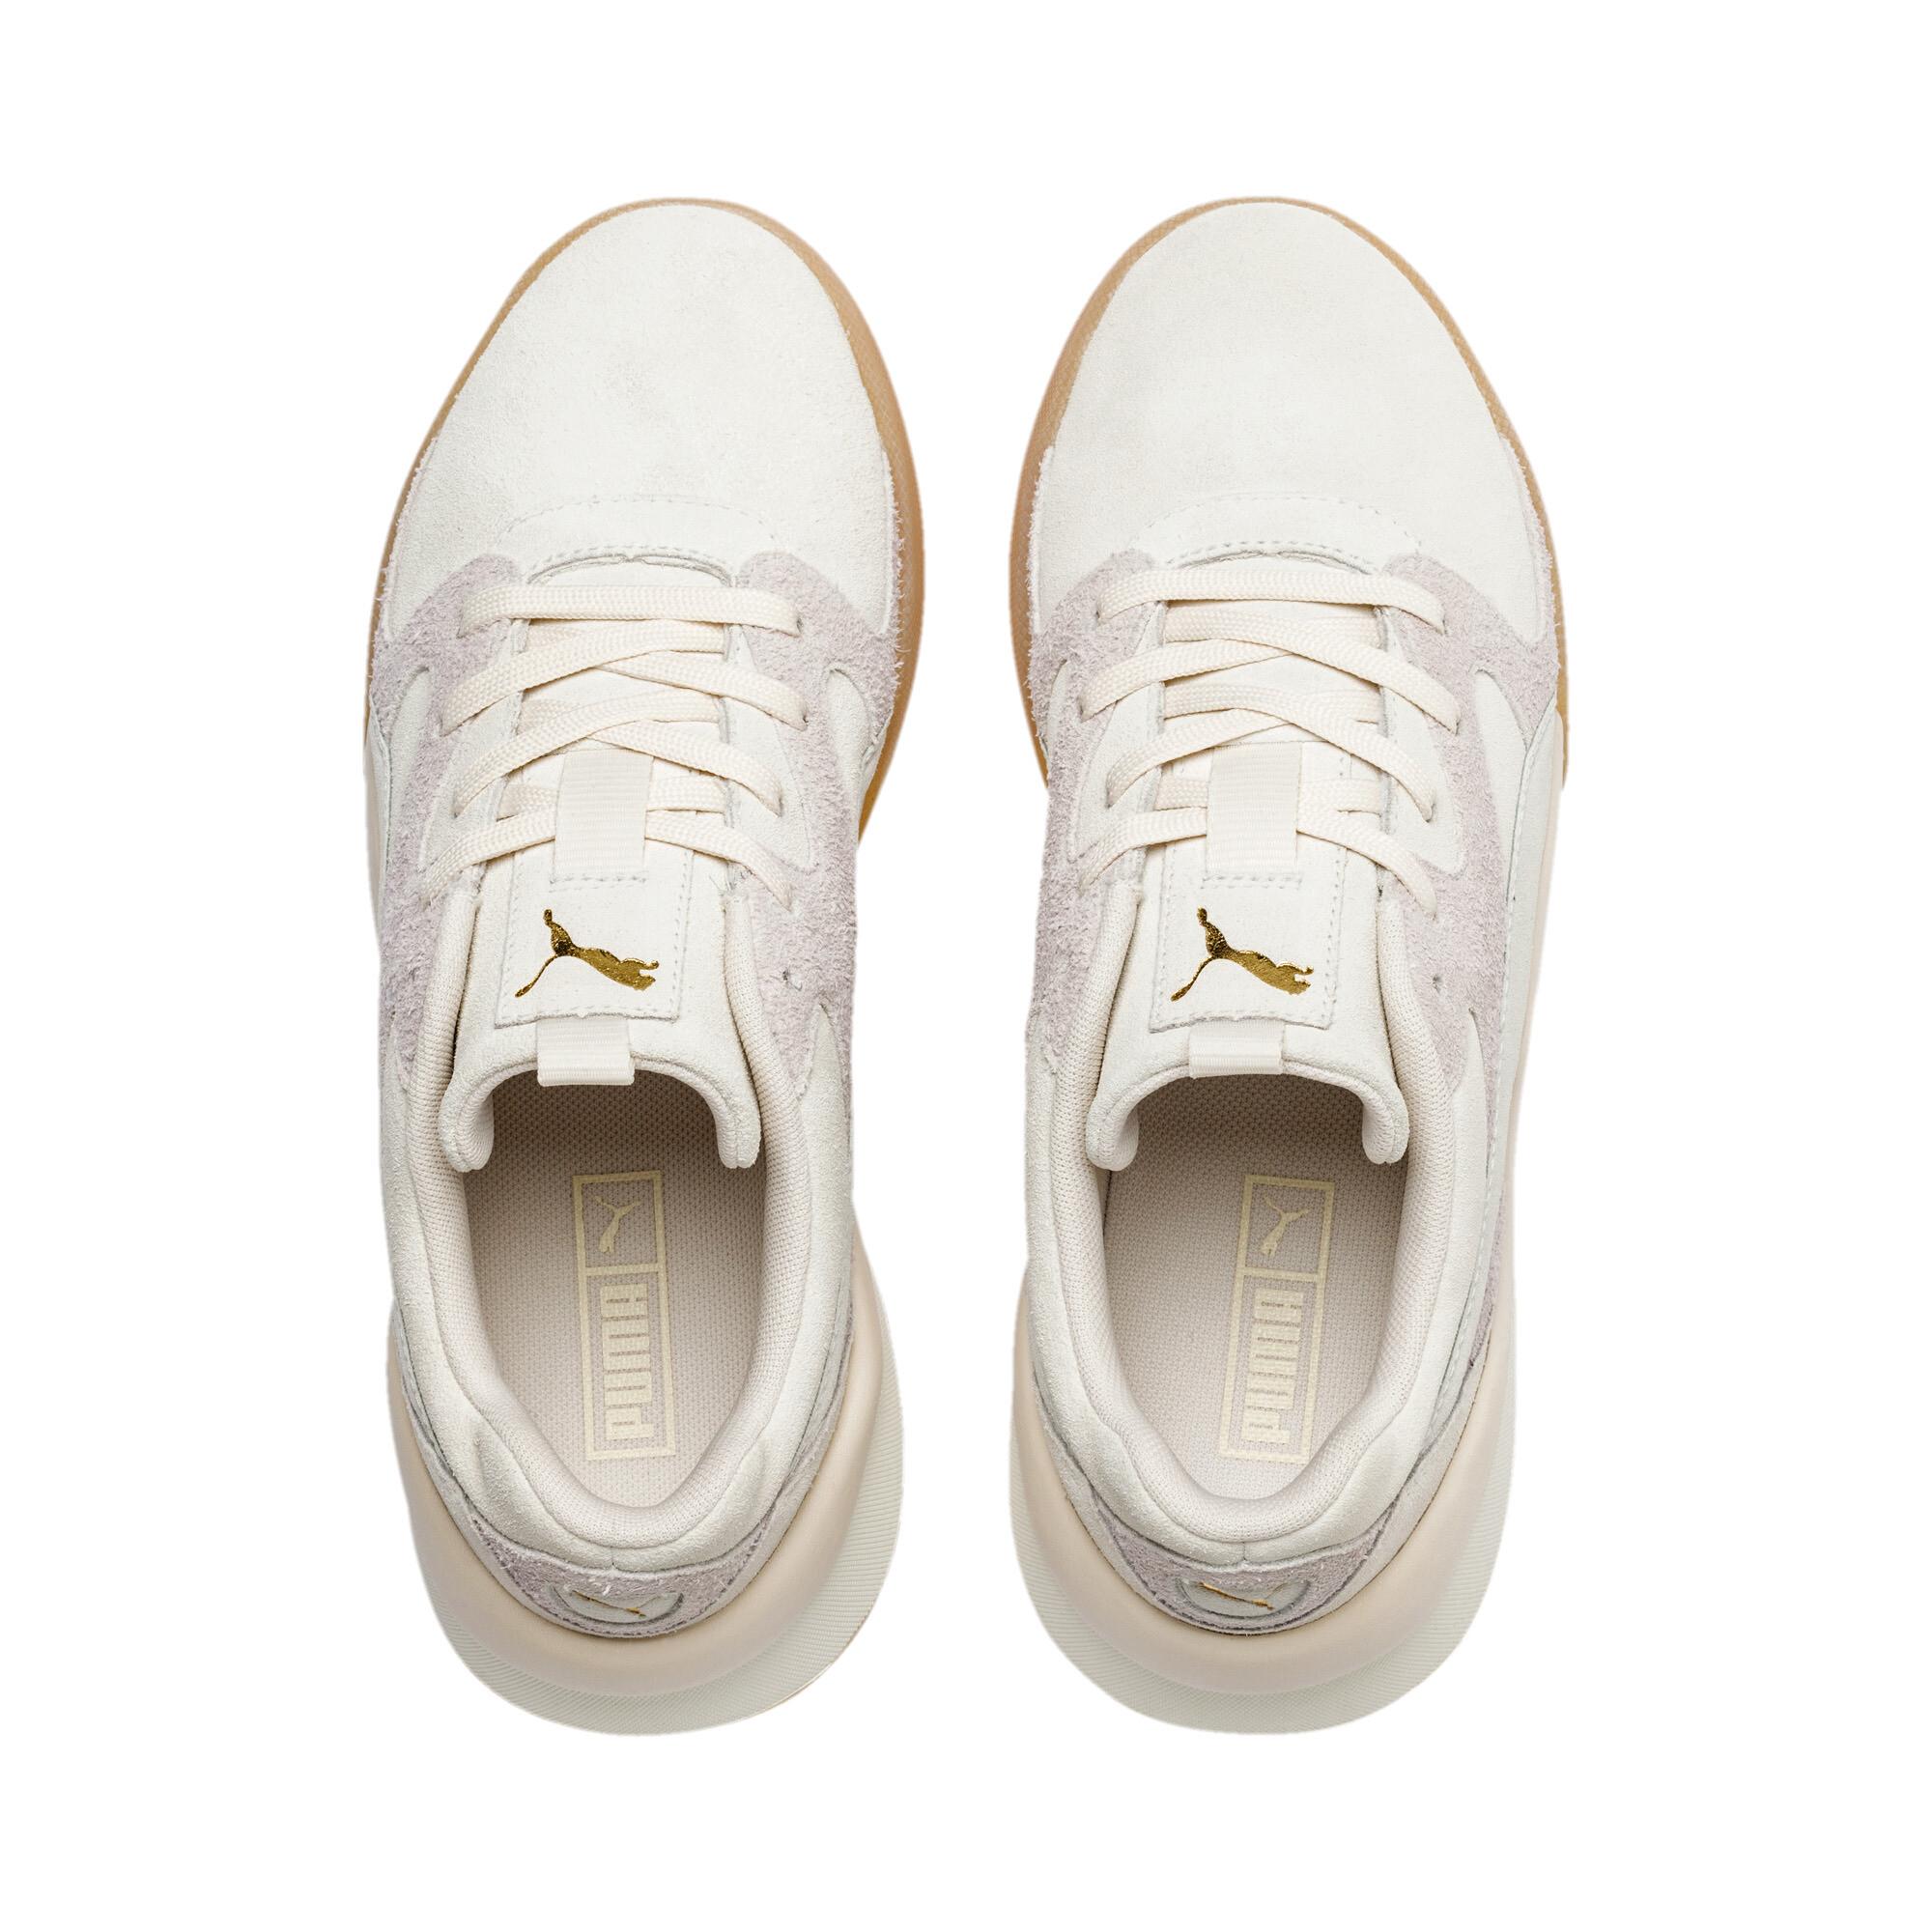 PUMA-Women-039-s-Aeon-Rewind-Sneakers thumbnail 8